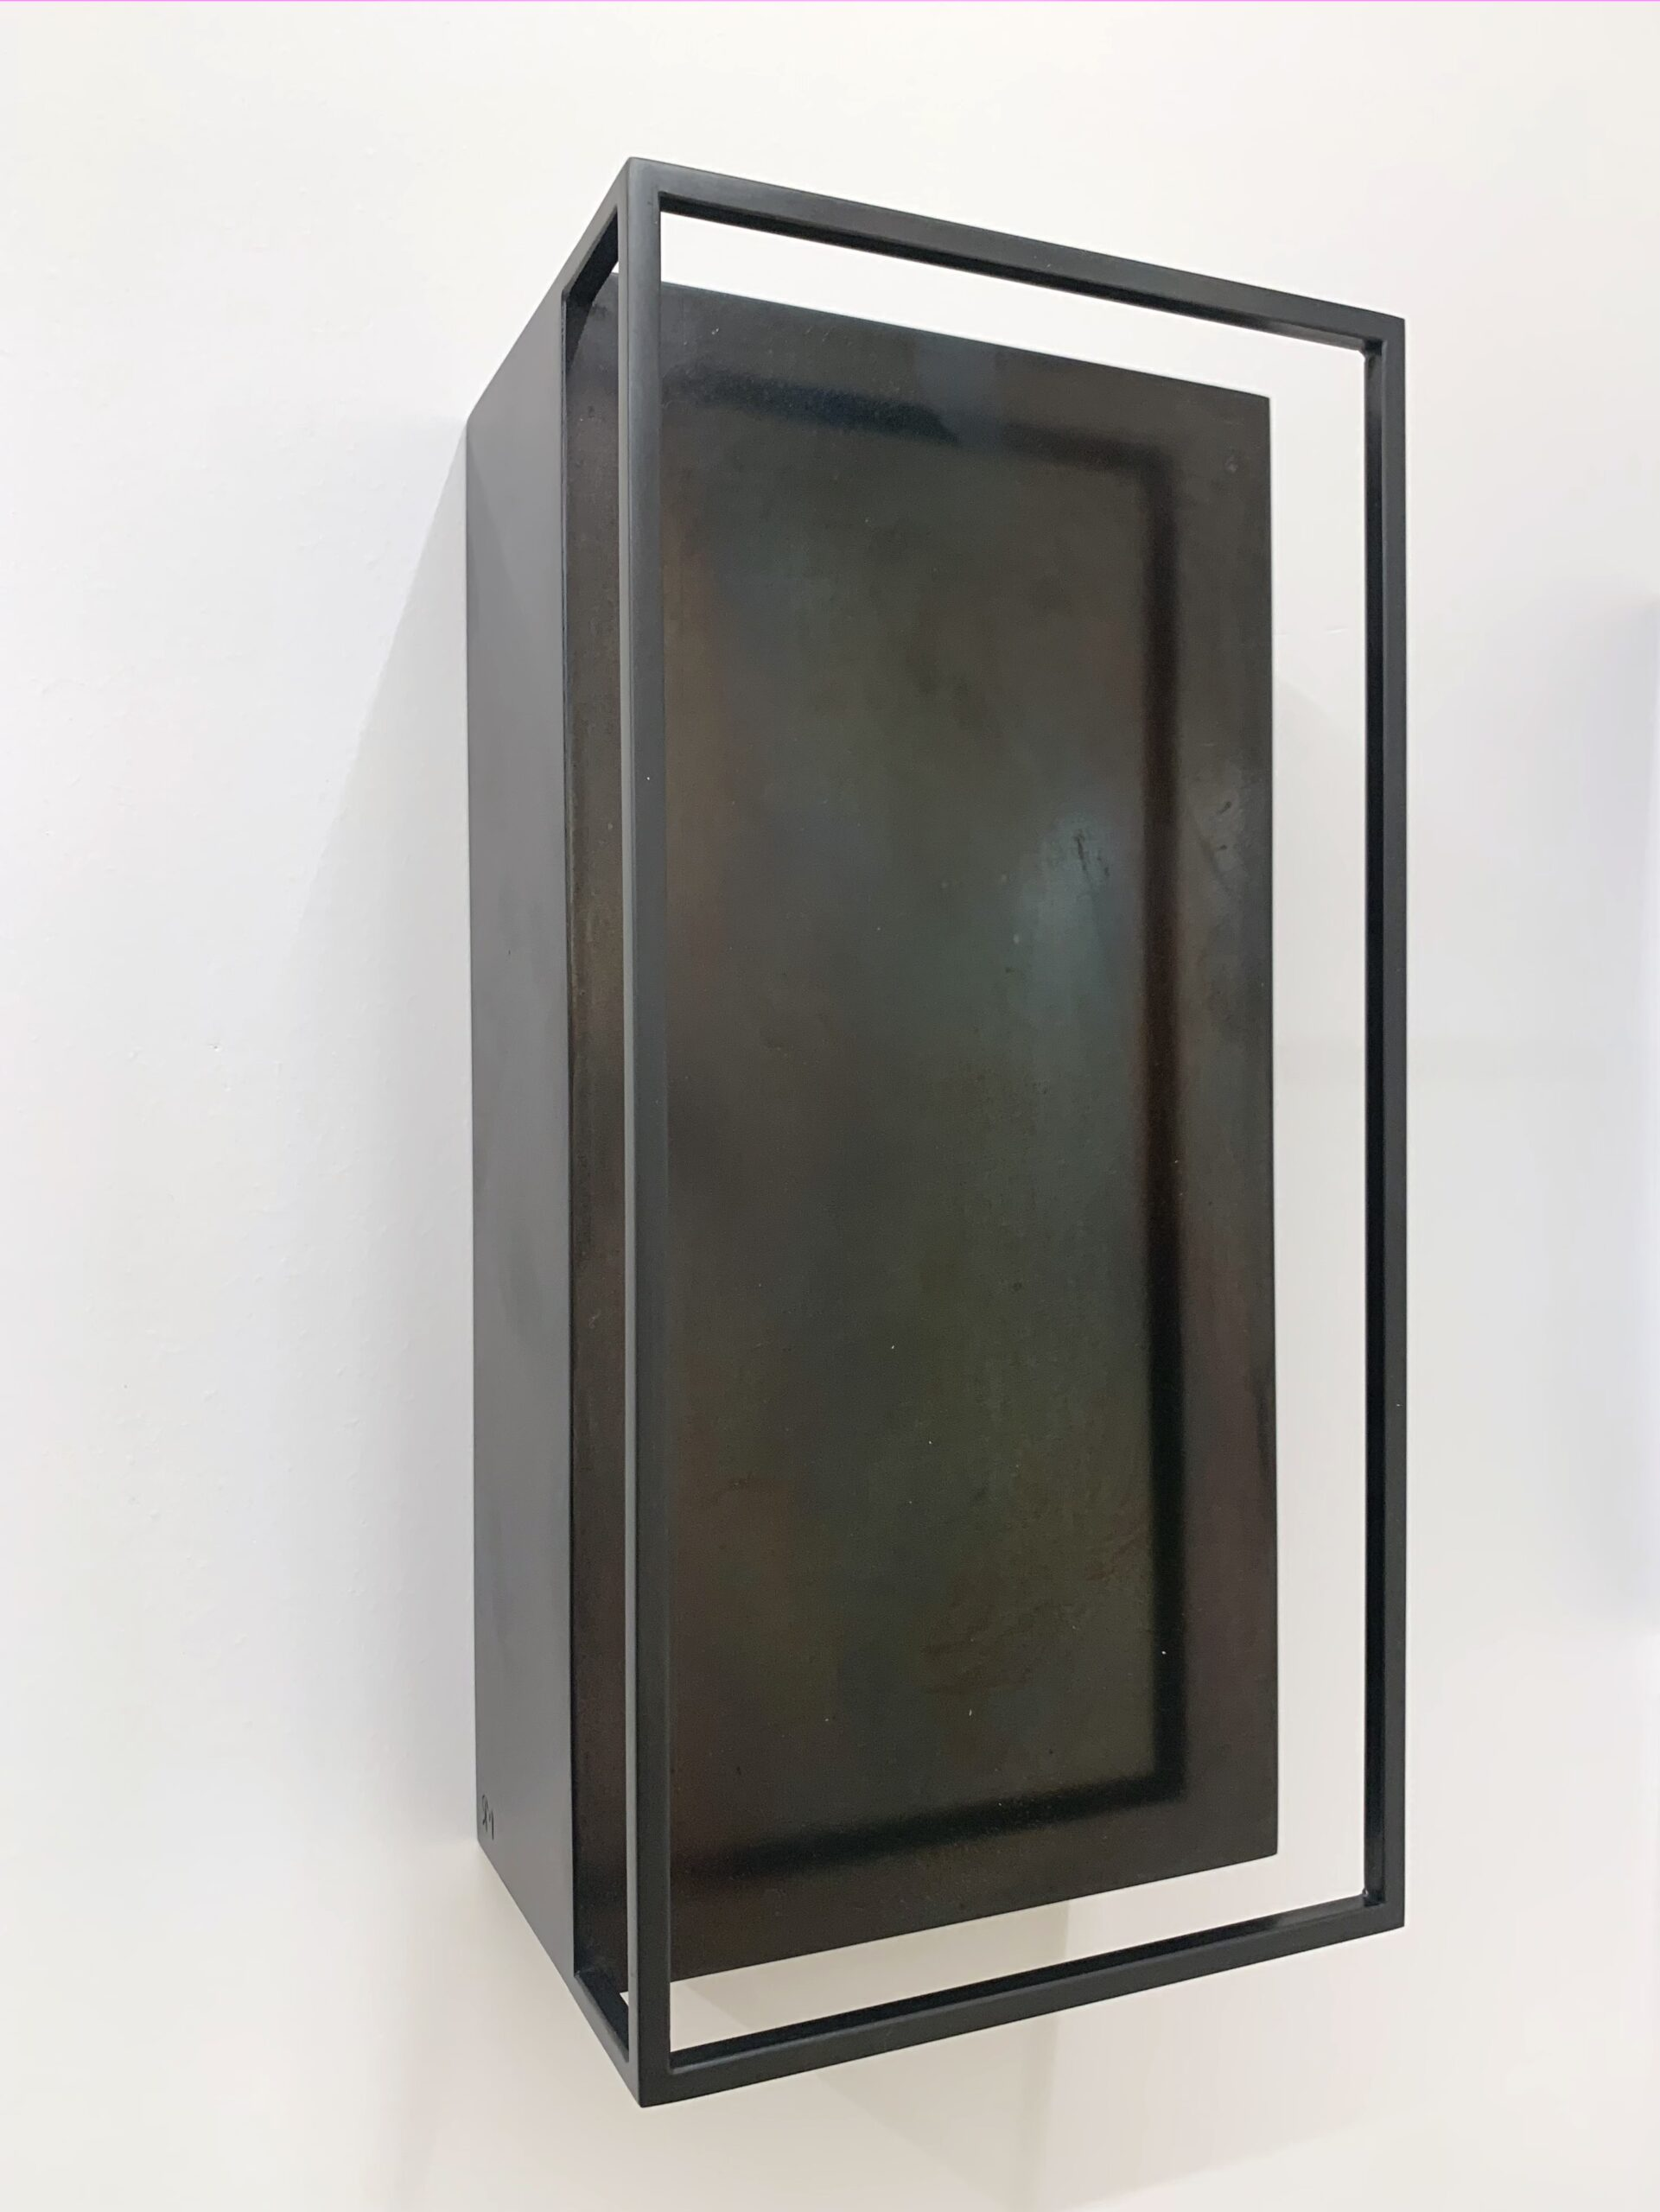 Riki Mijling, Steel Sculpture